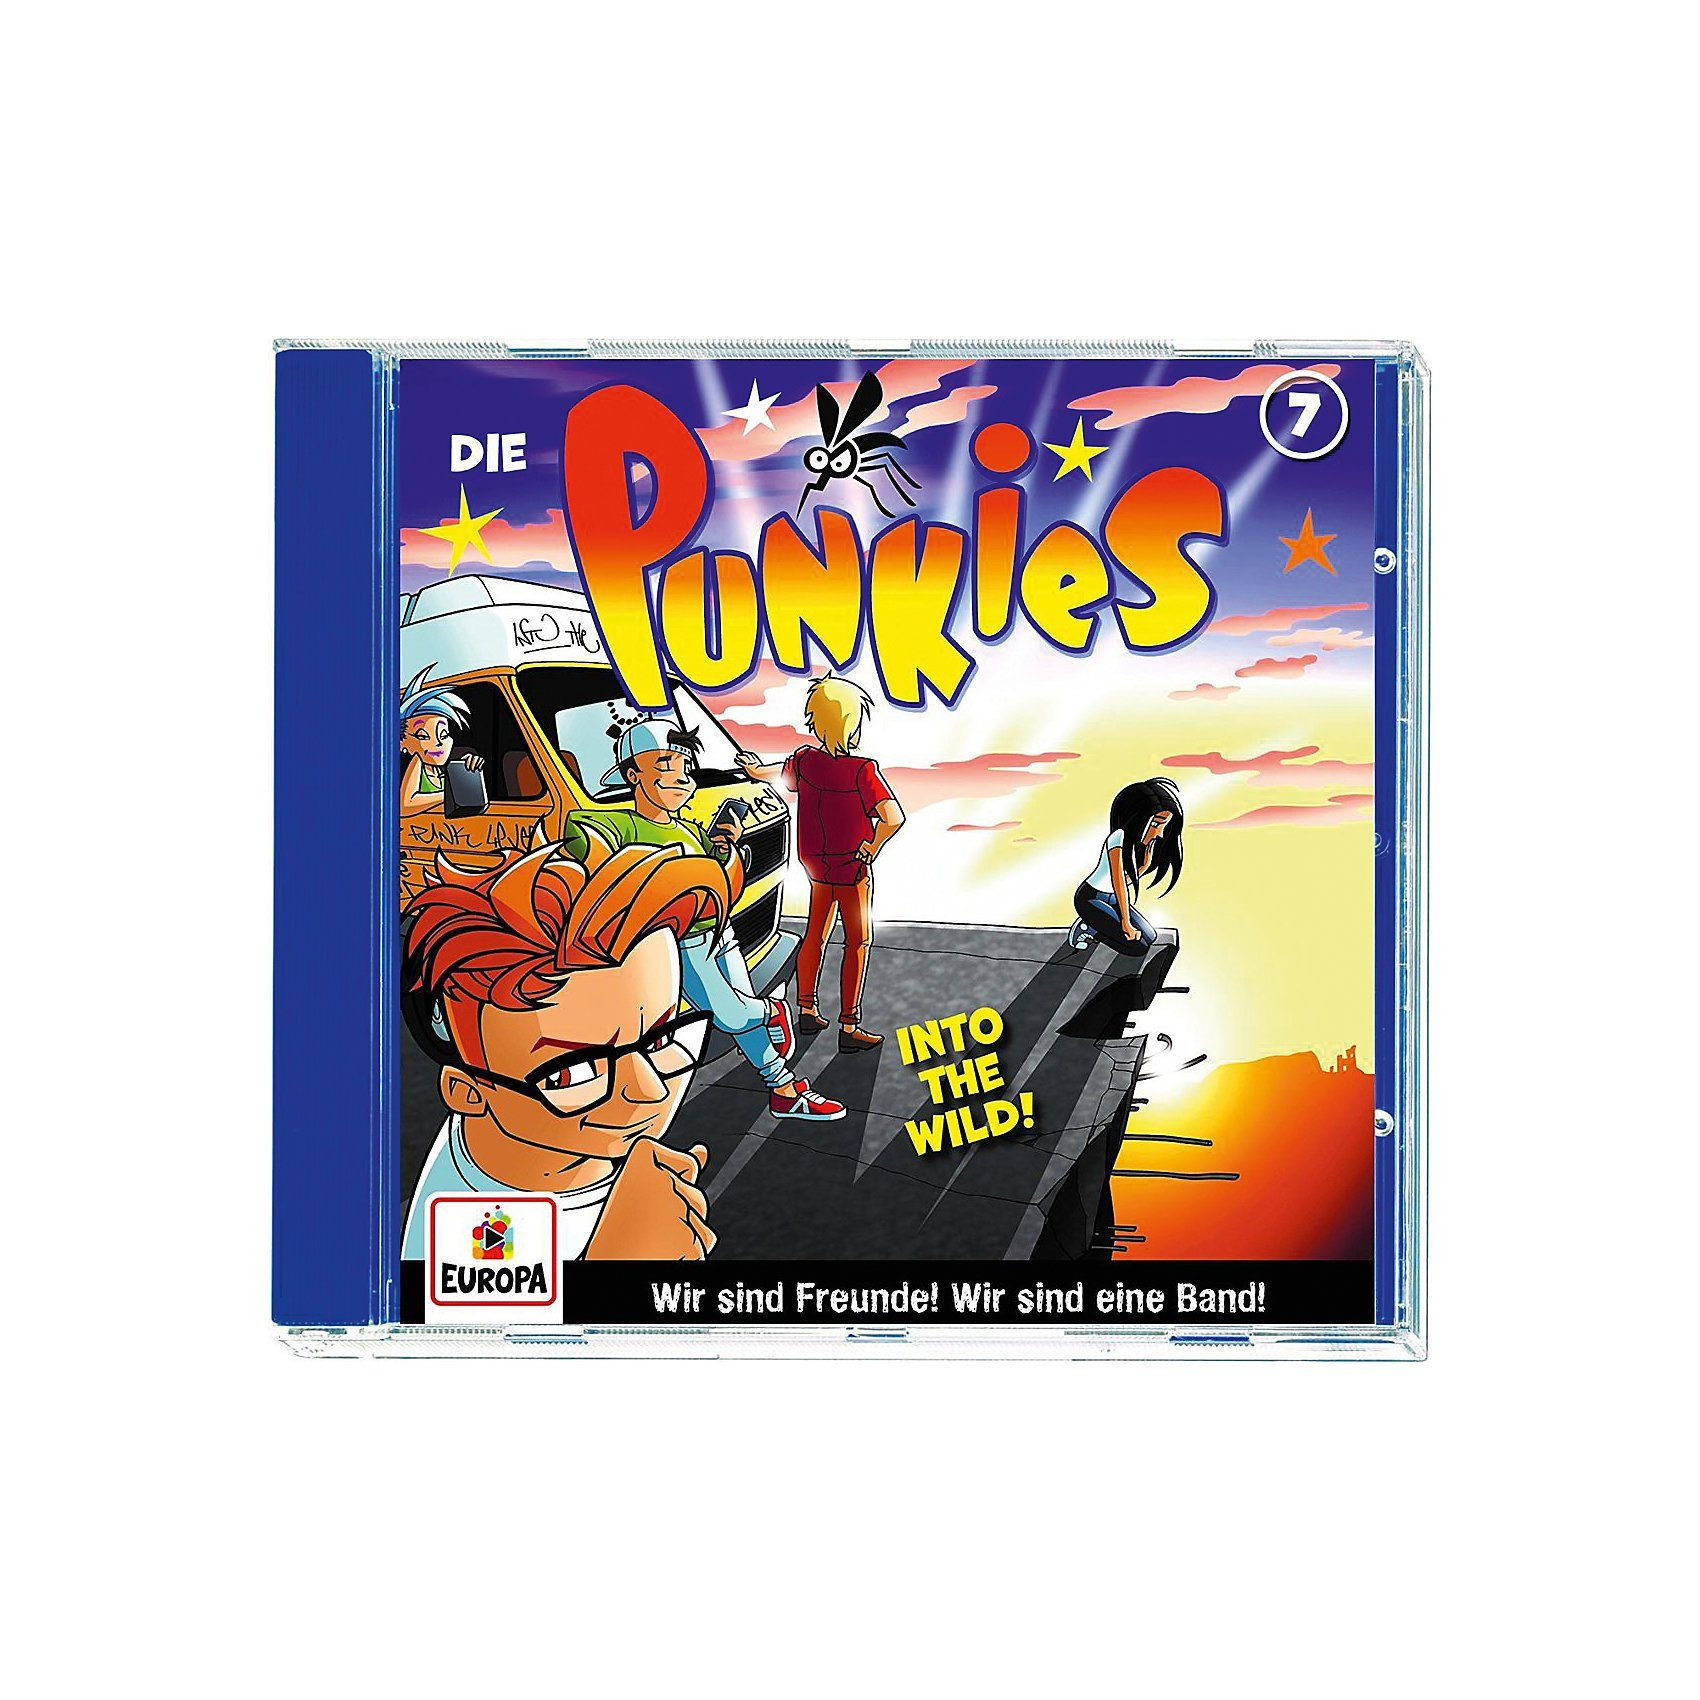 Sony CD Die Punkies 07 - Into the Wild!